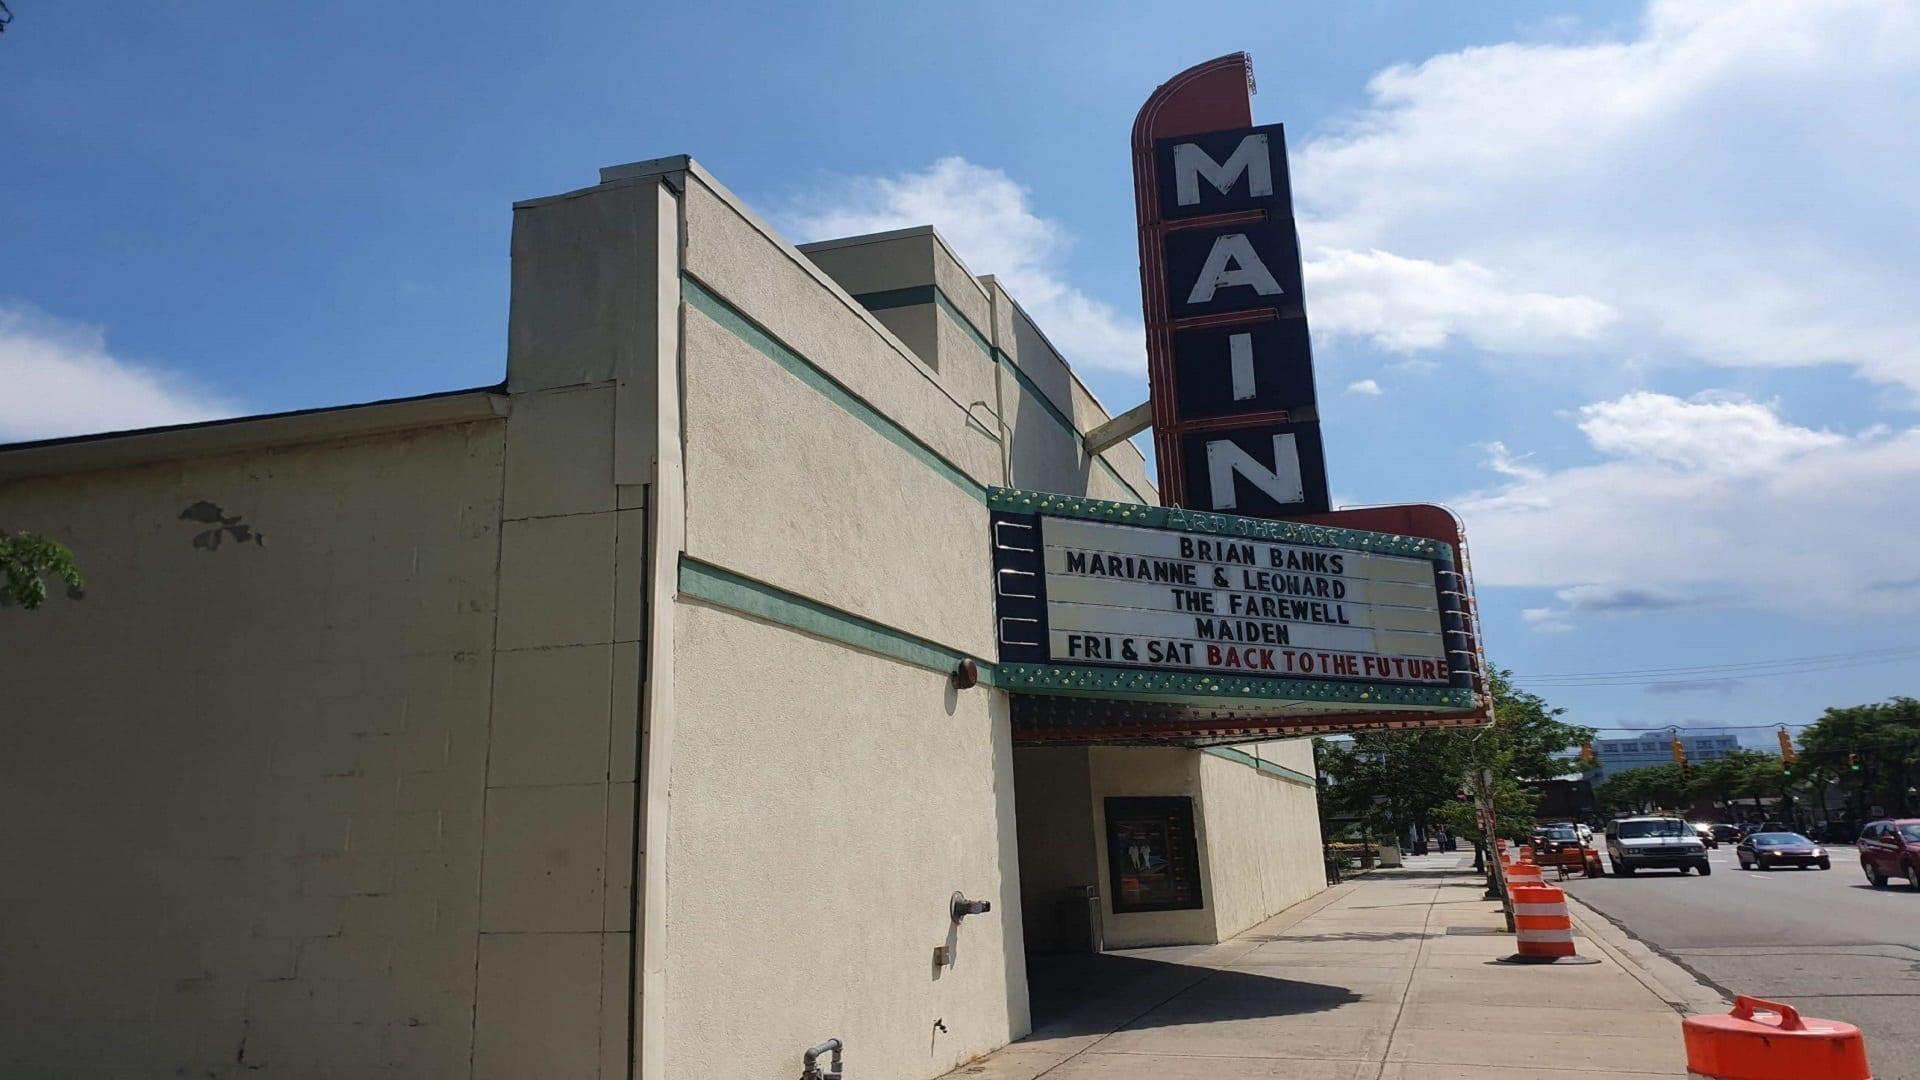 Cat Film Festival at Royal Oak Main Art Theater - Detroit On Tap